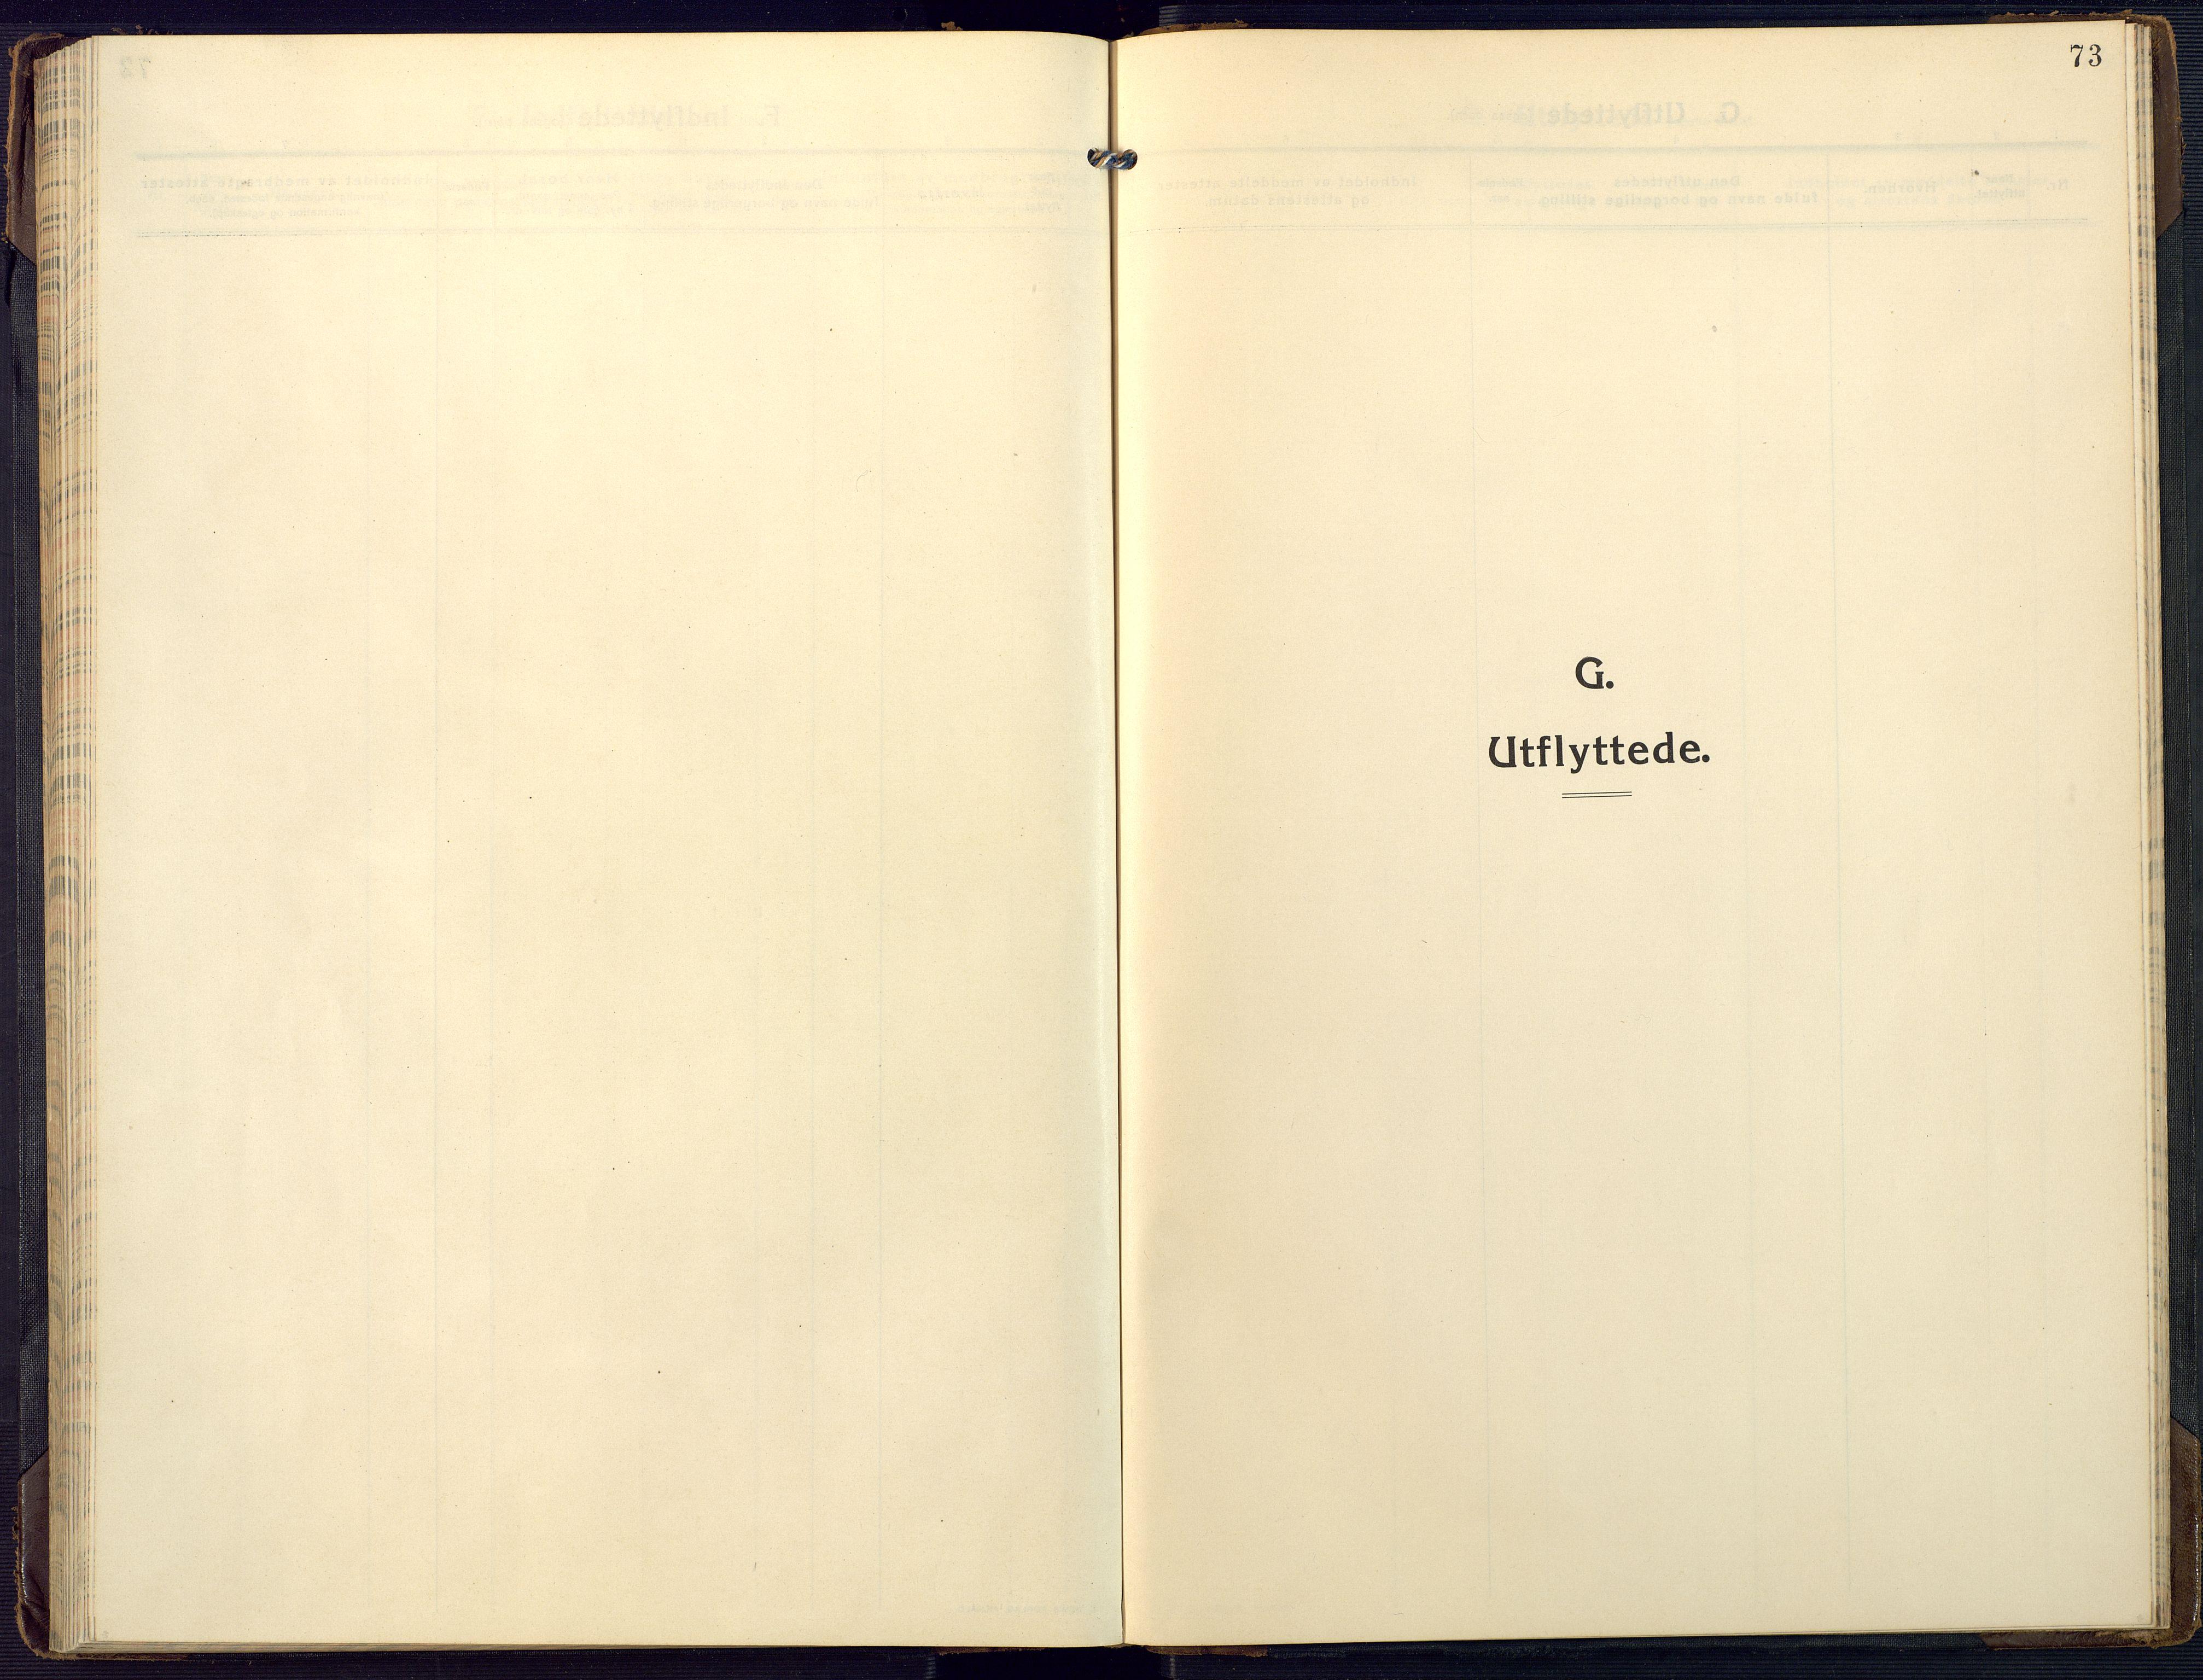 SAK, Mandal sokneprestkontor, F/Fa/Fab/L0003: Ministerialbok nr. A 3, 1913-1933, s. 73